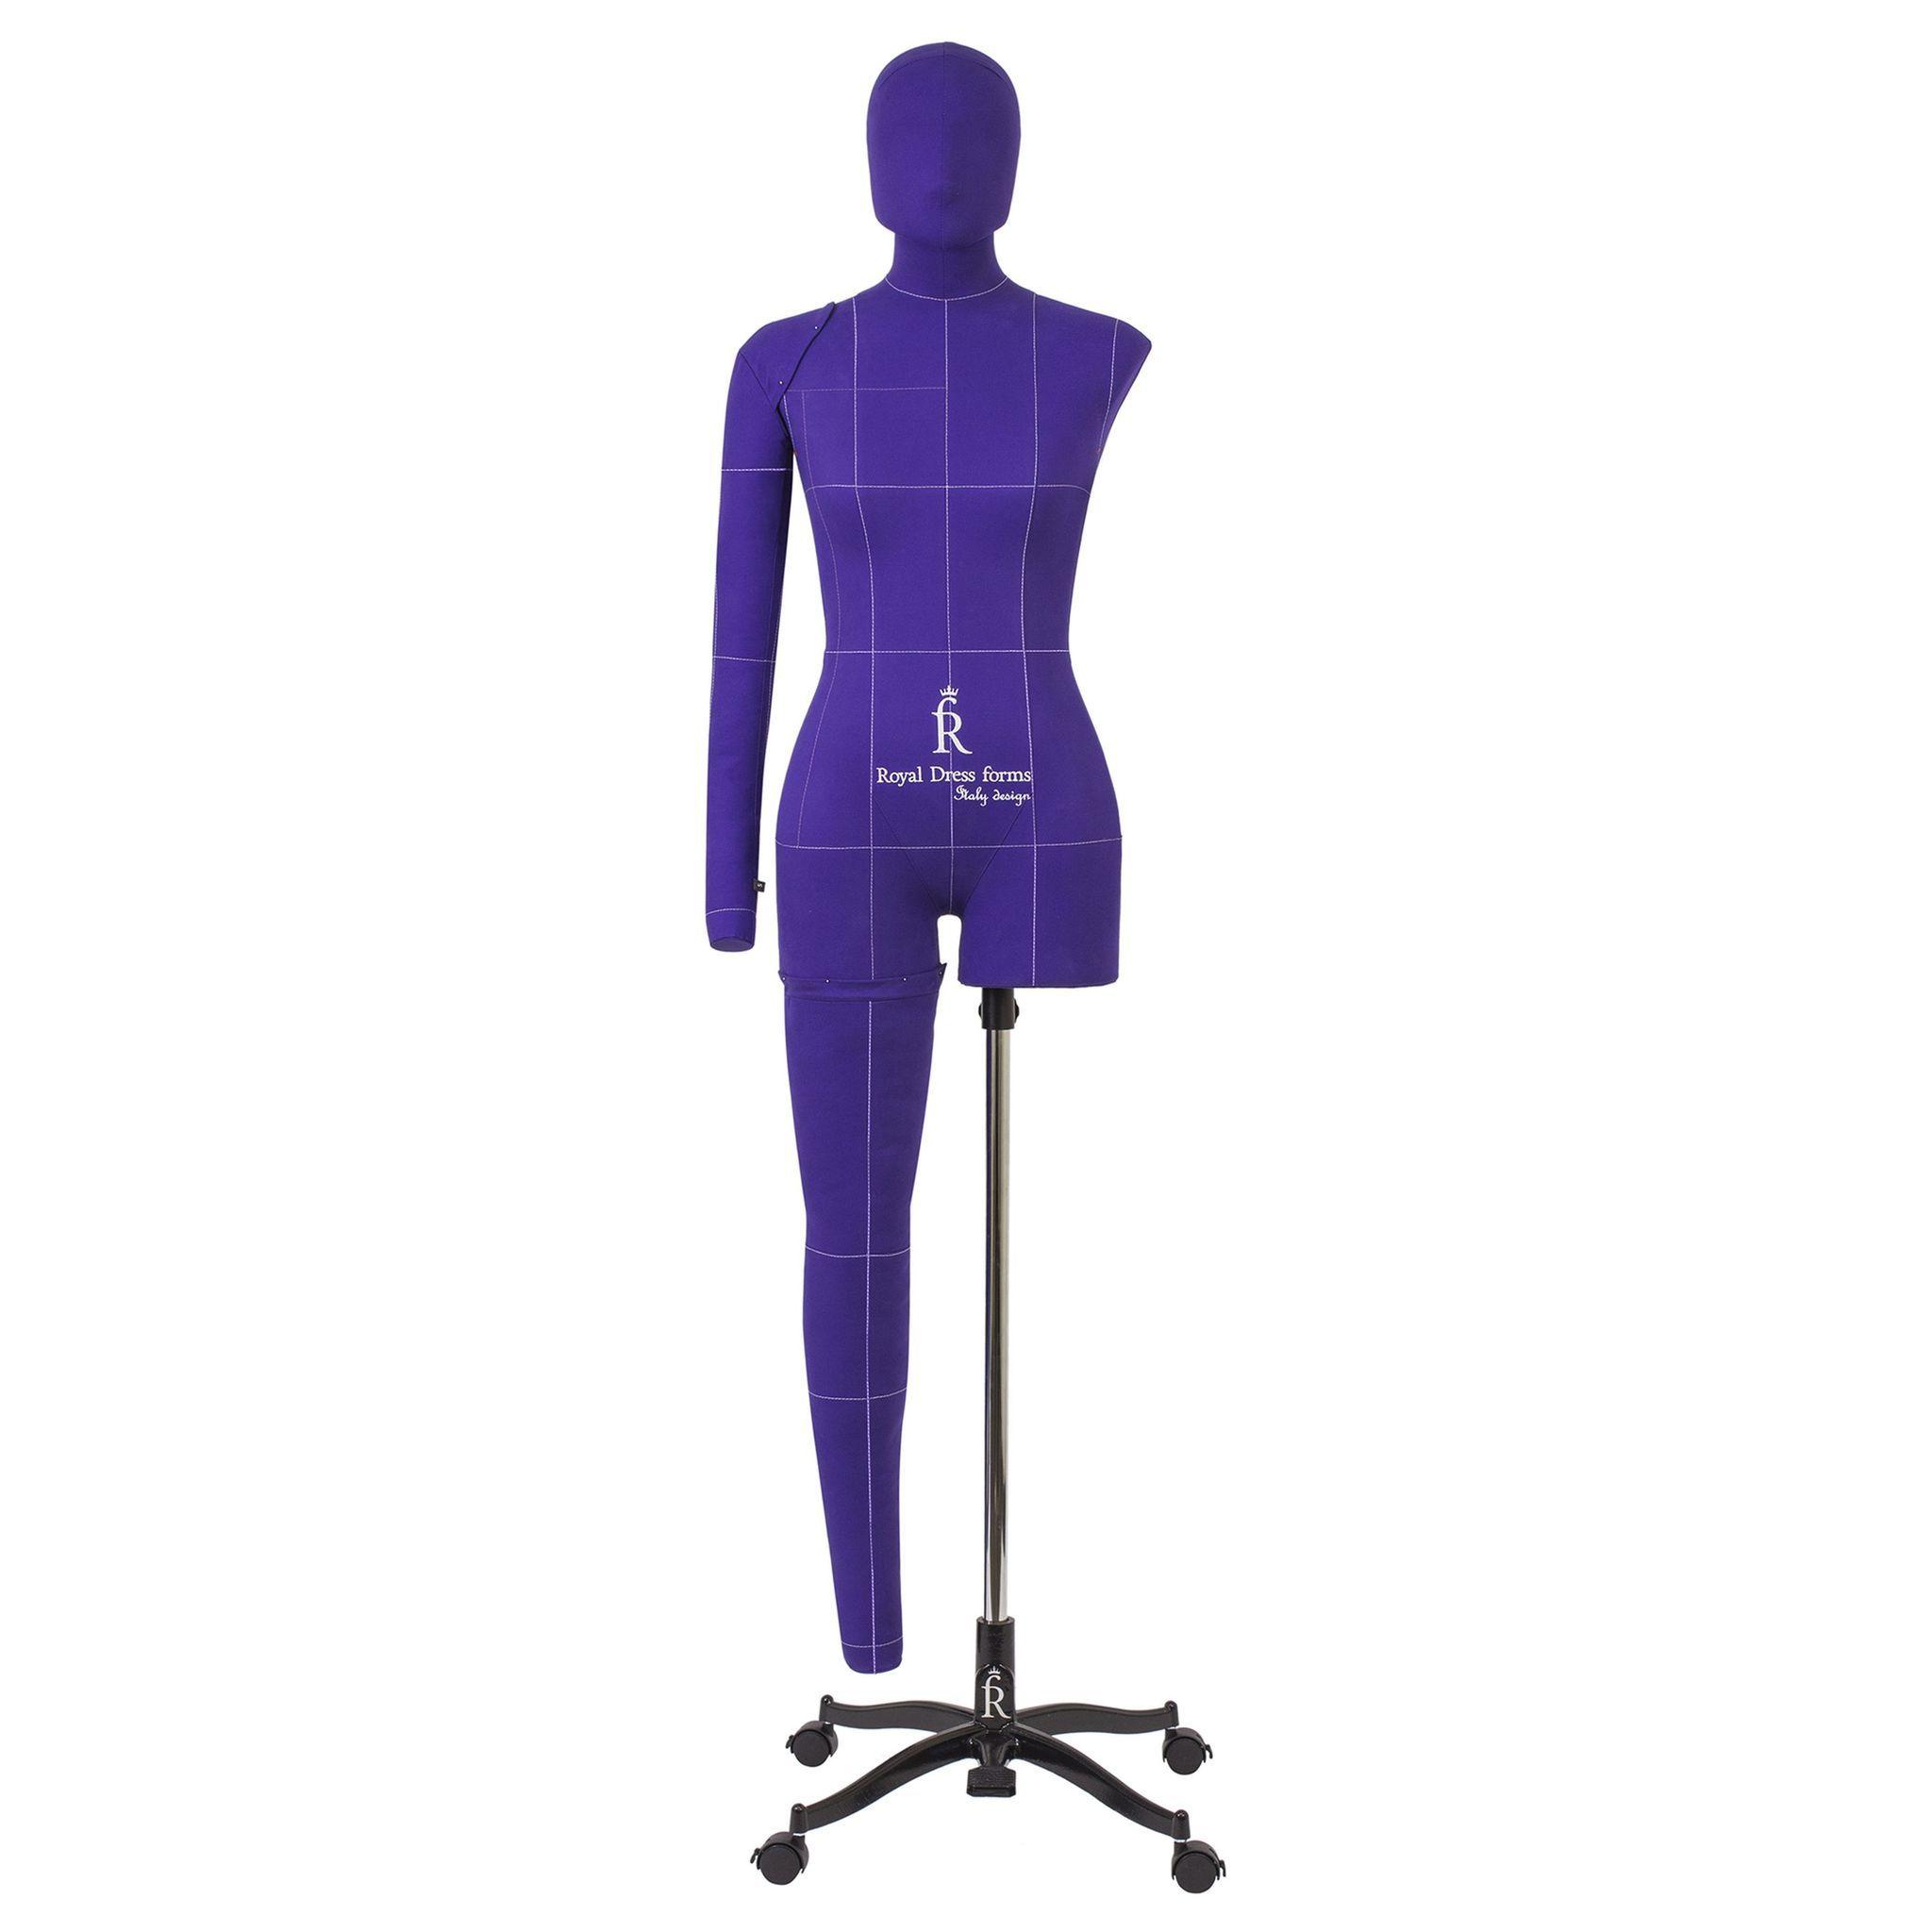 Манекен портновский Моника, комплект Арт, размер 44, ФиолетовыйФото 3